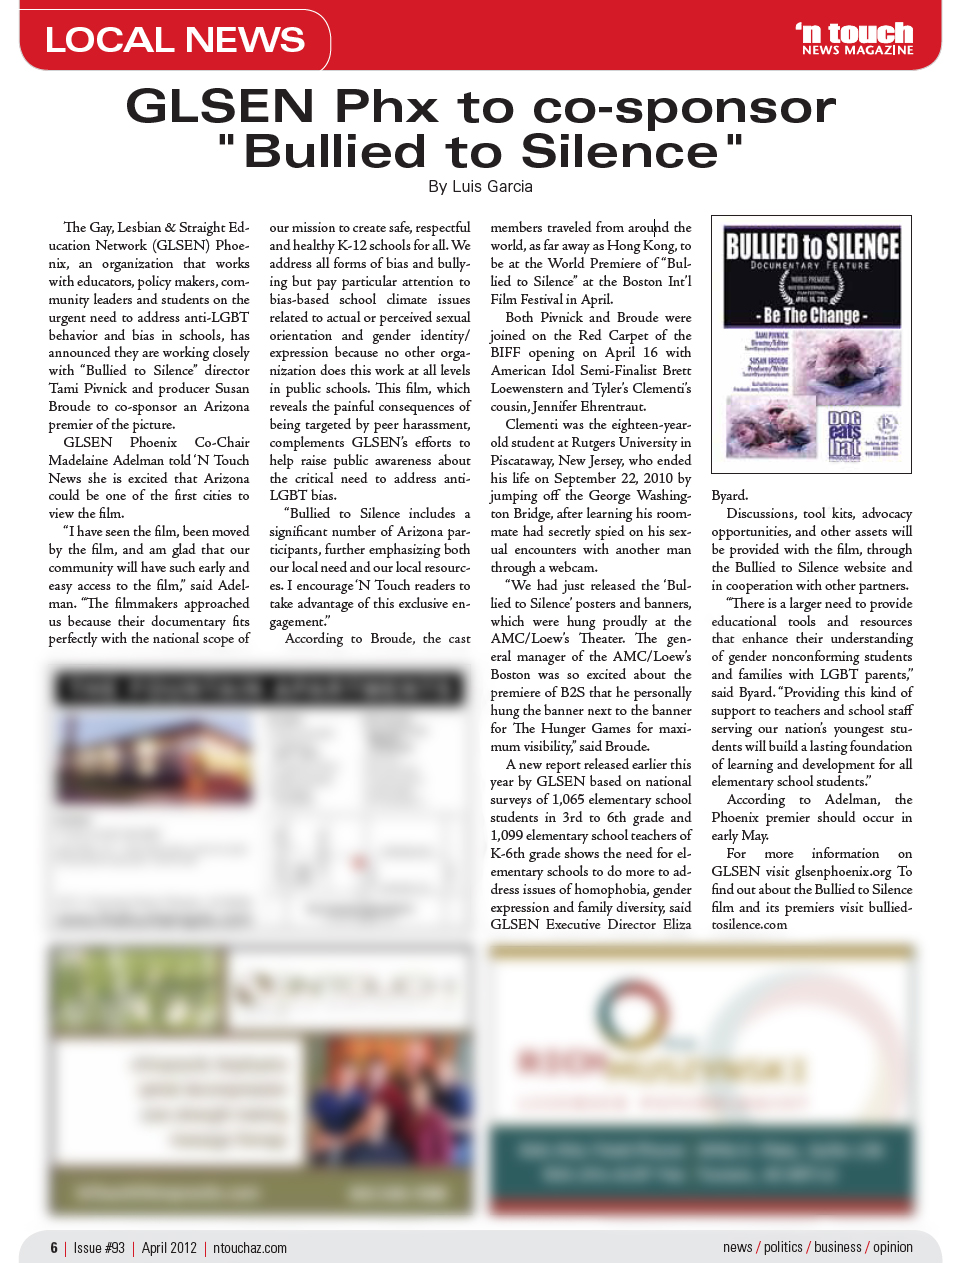 Bullying magazine